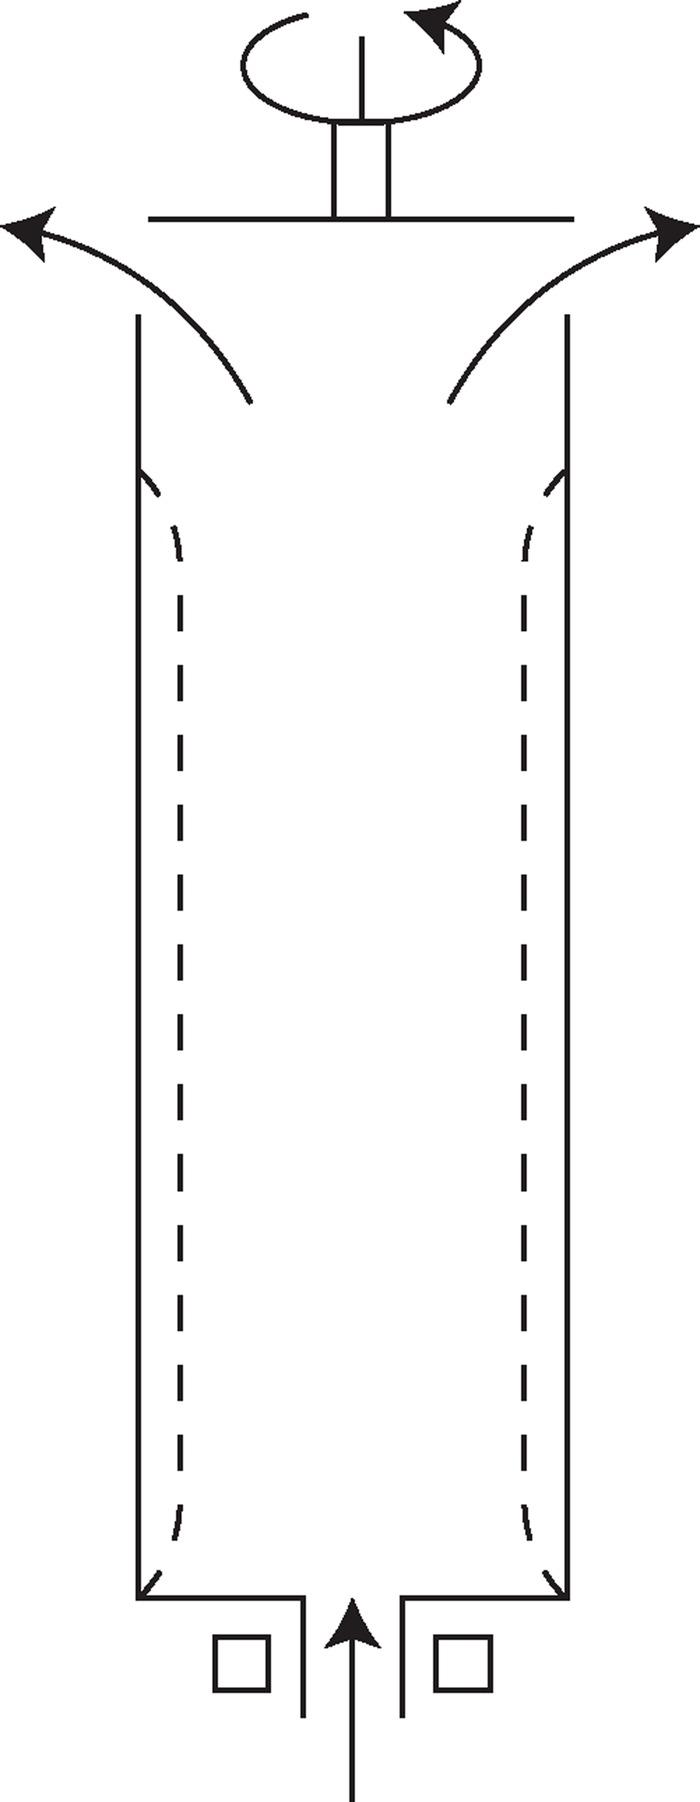 Routledge Handbooks Online Voucher Deposit Kh Rp 500000 Simplified Diagram Of A Tubular Bowl Centrifuge